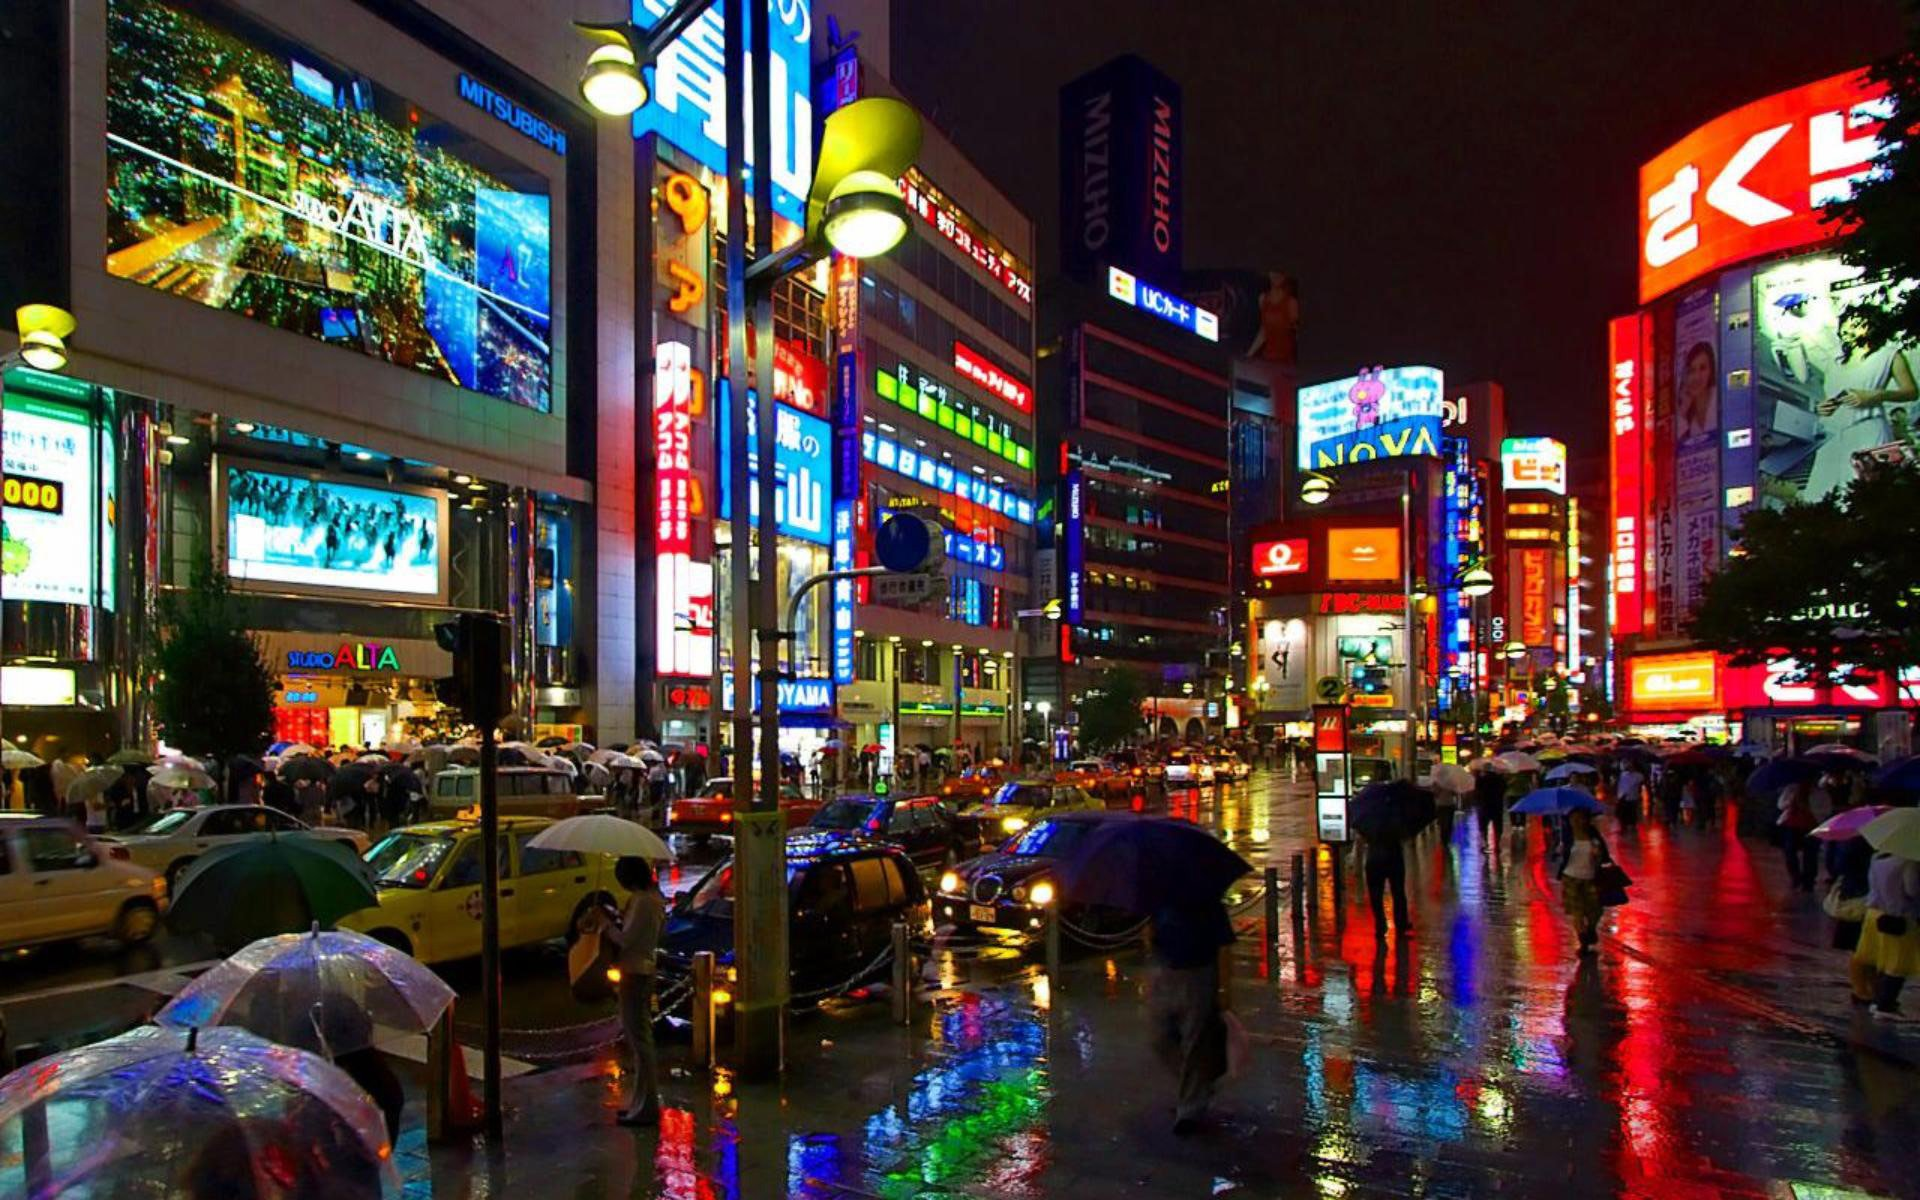 Tokyo at night wallpaper   723910 1920x1200